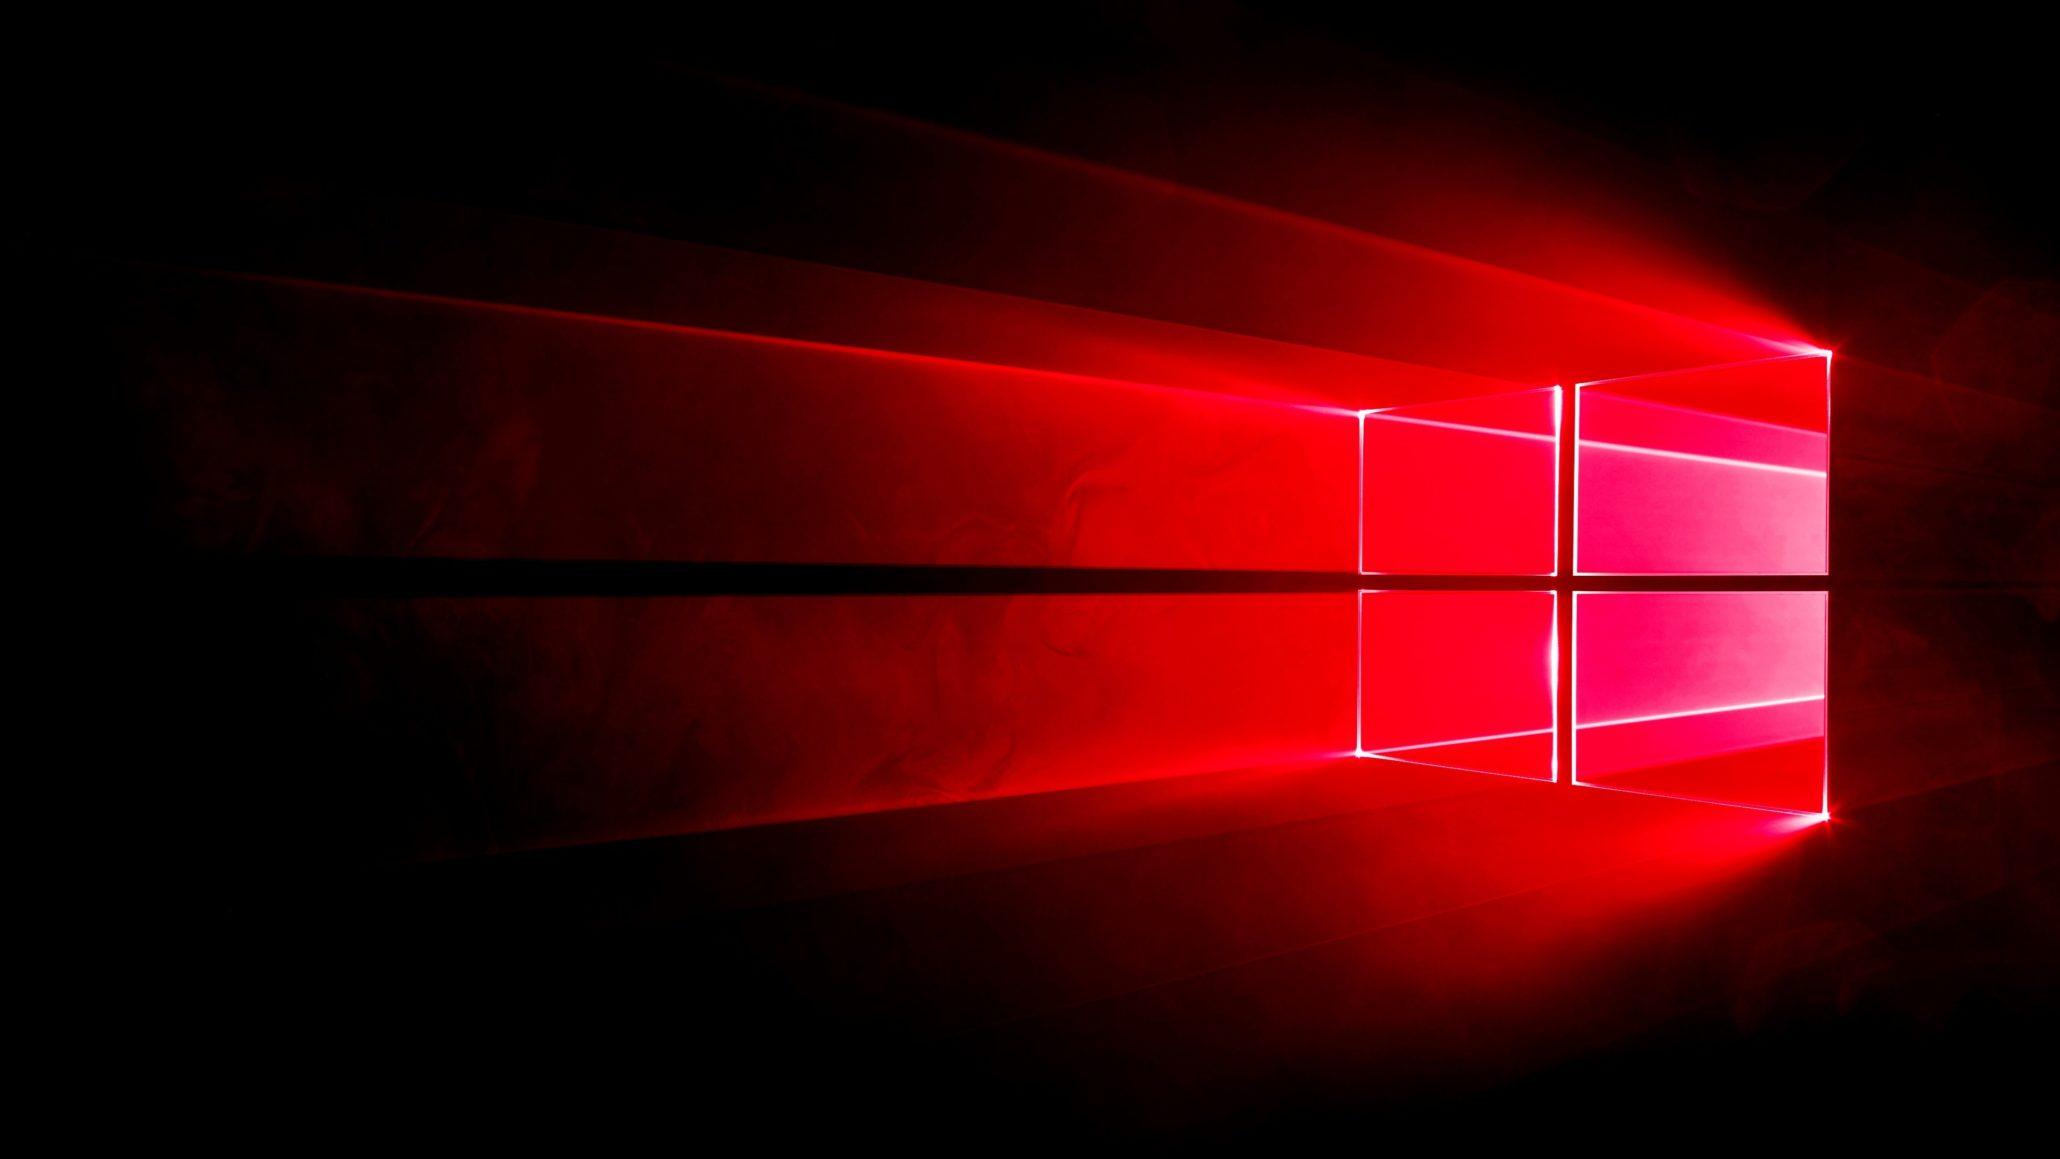 windows 10 redstone free download